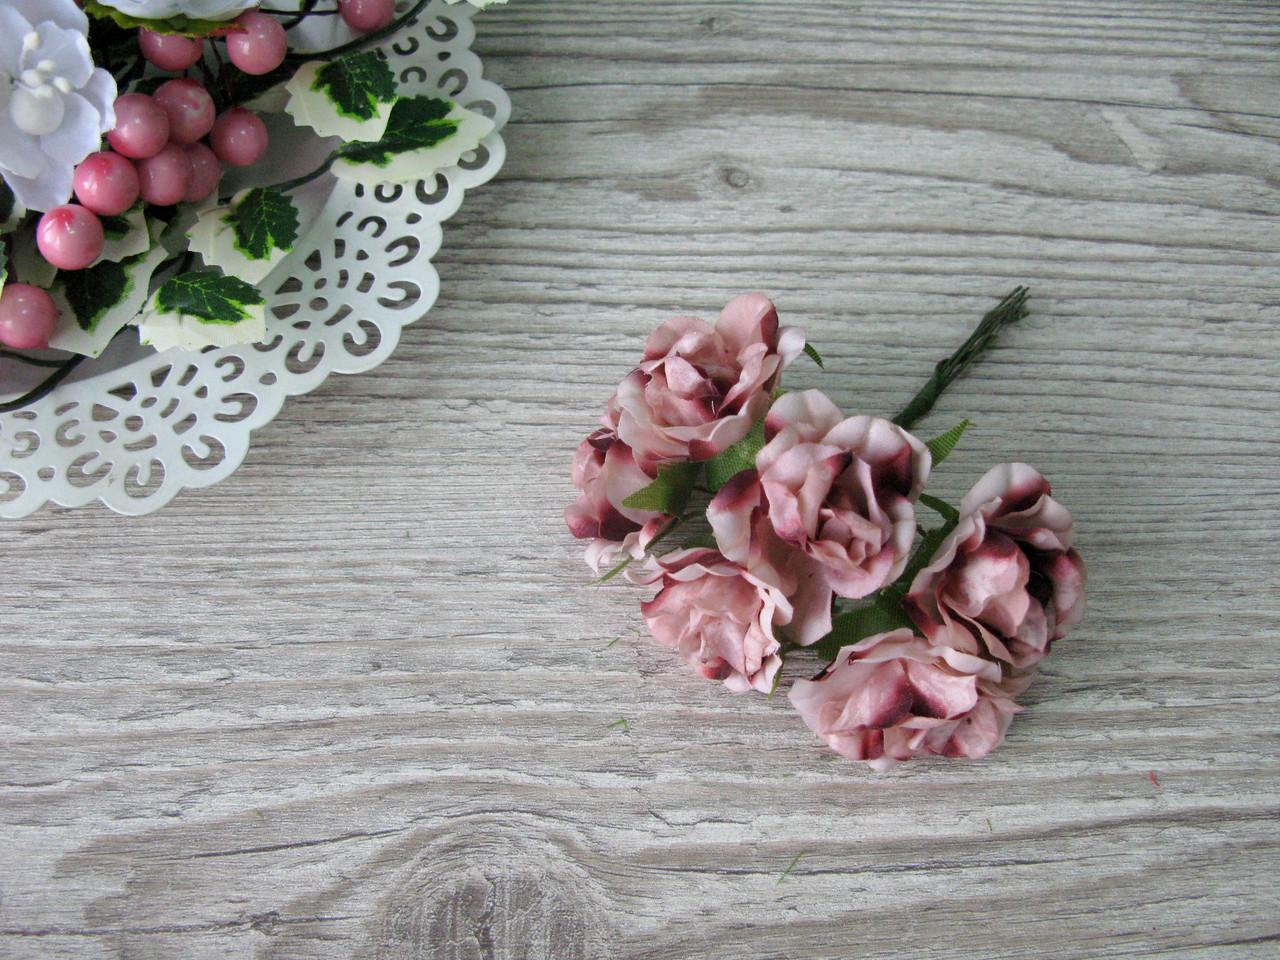 Роза тканевая пудровая (бежевая) 3.5 см пучок 6 шт - 20 грн